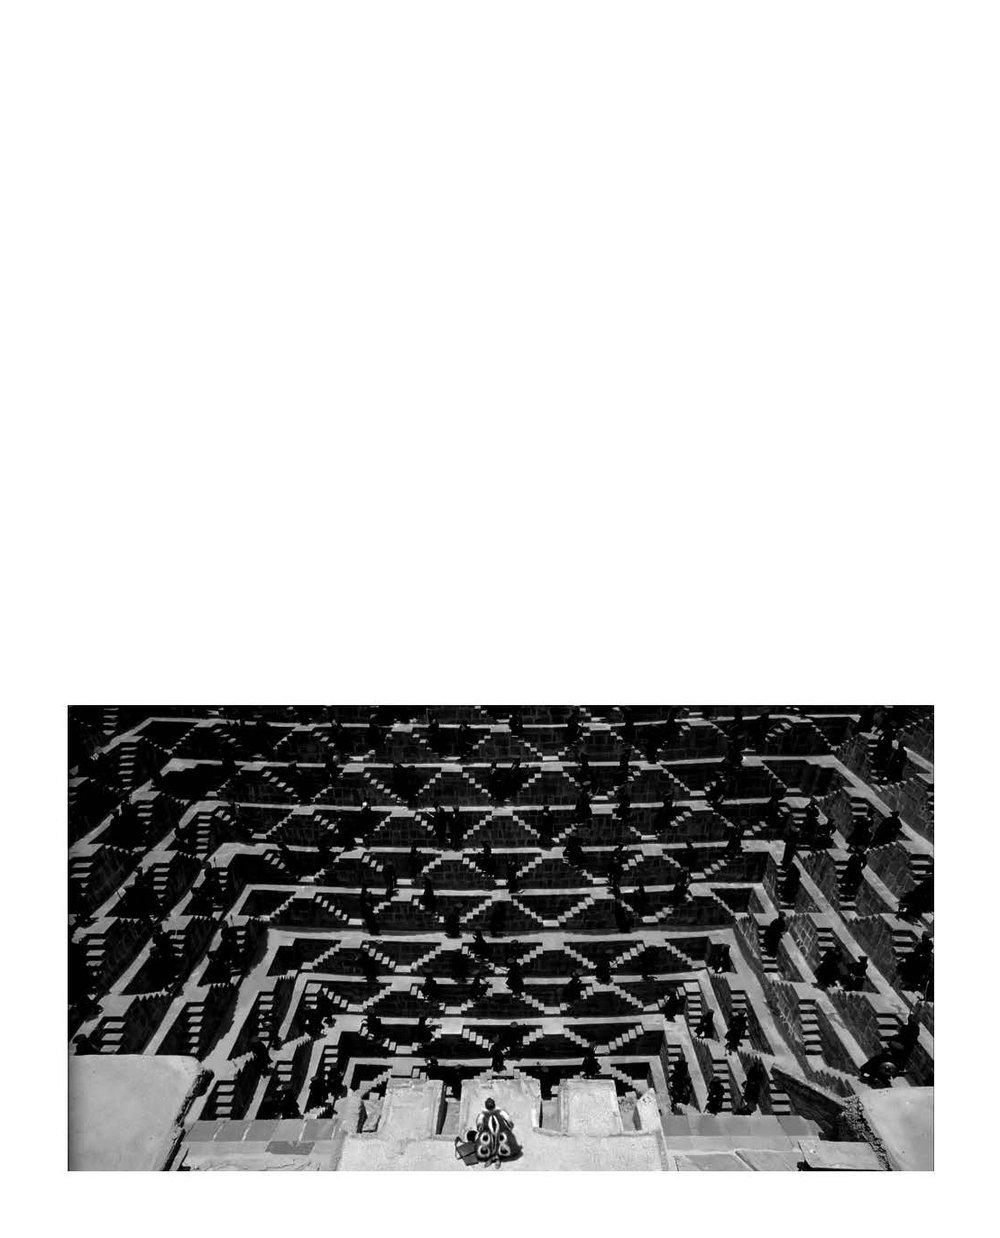 256_Final_Page_092.jpg